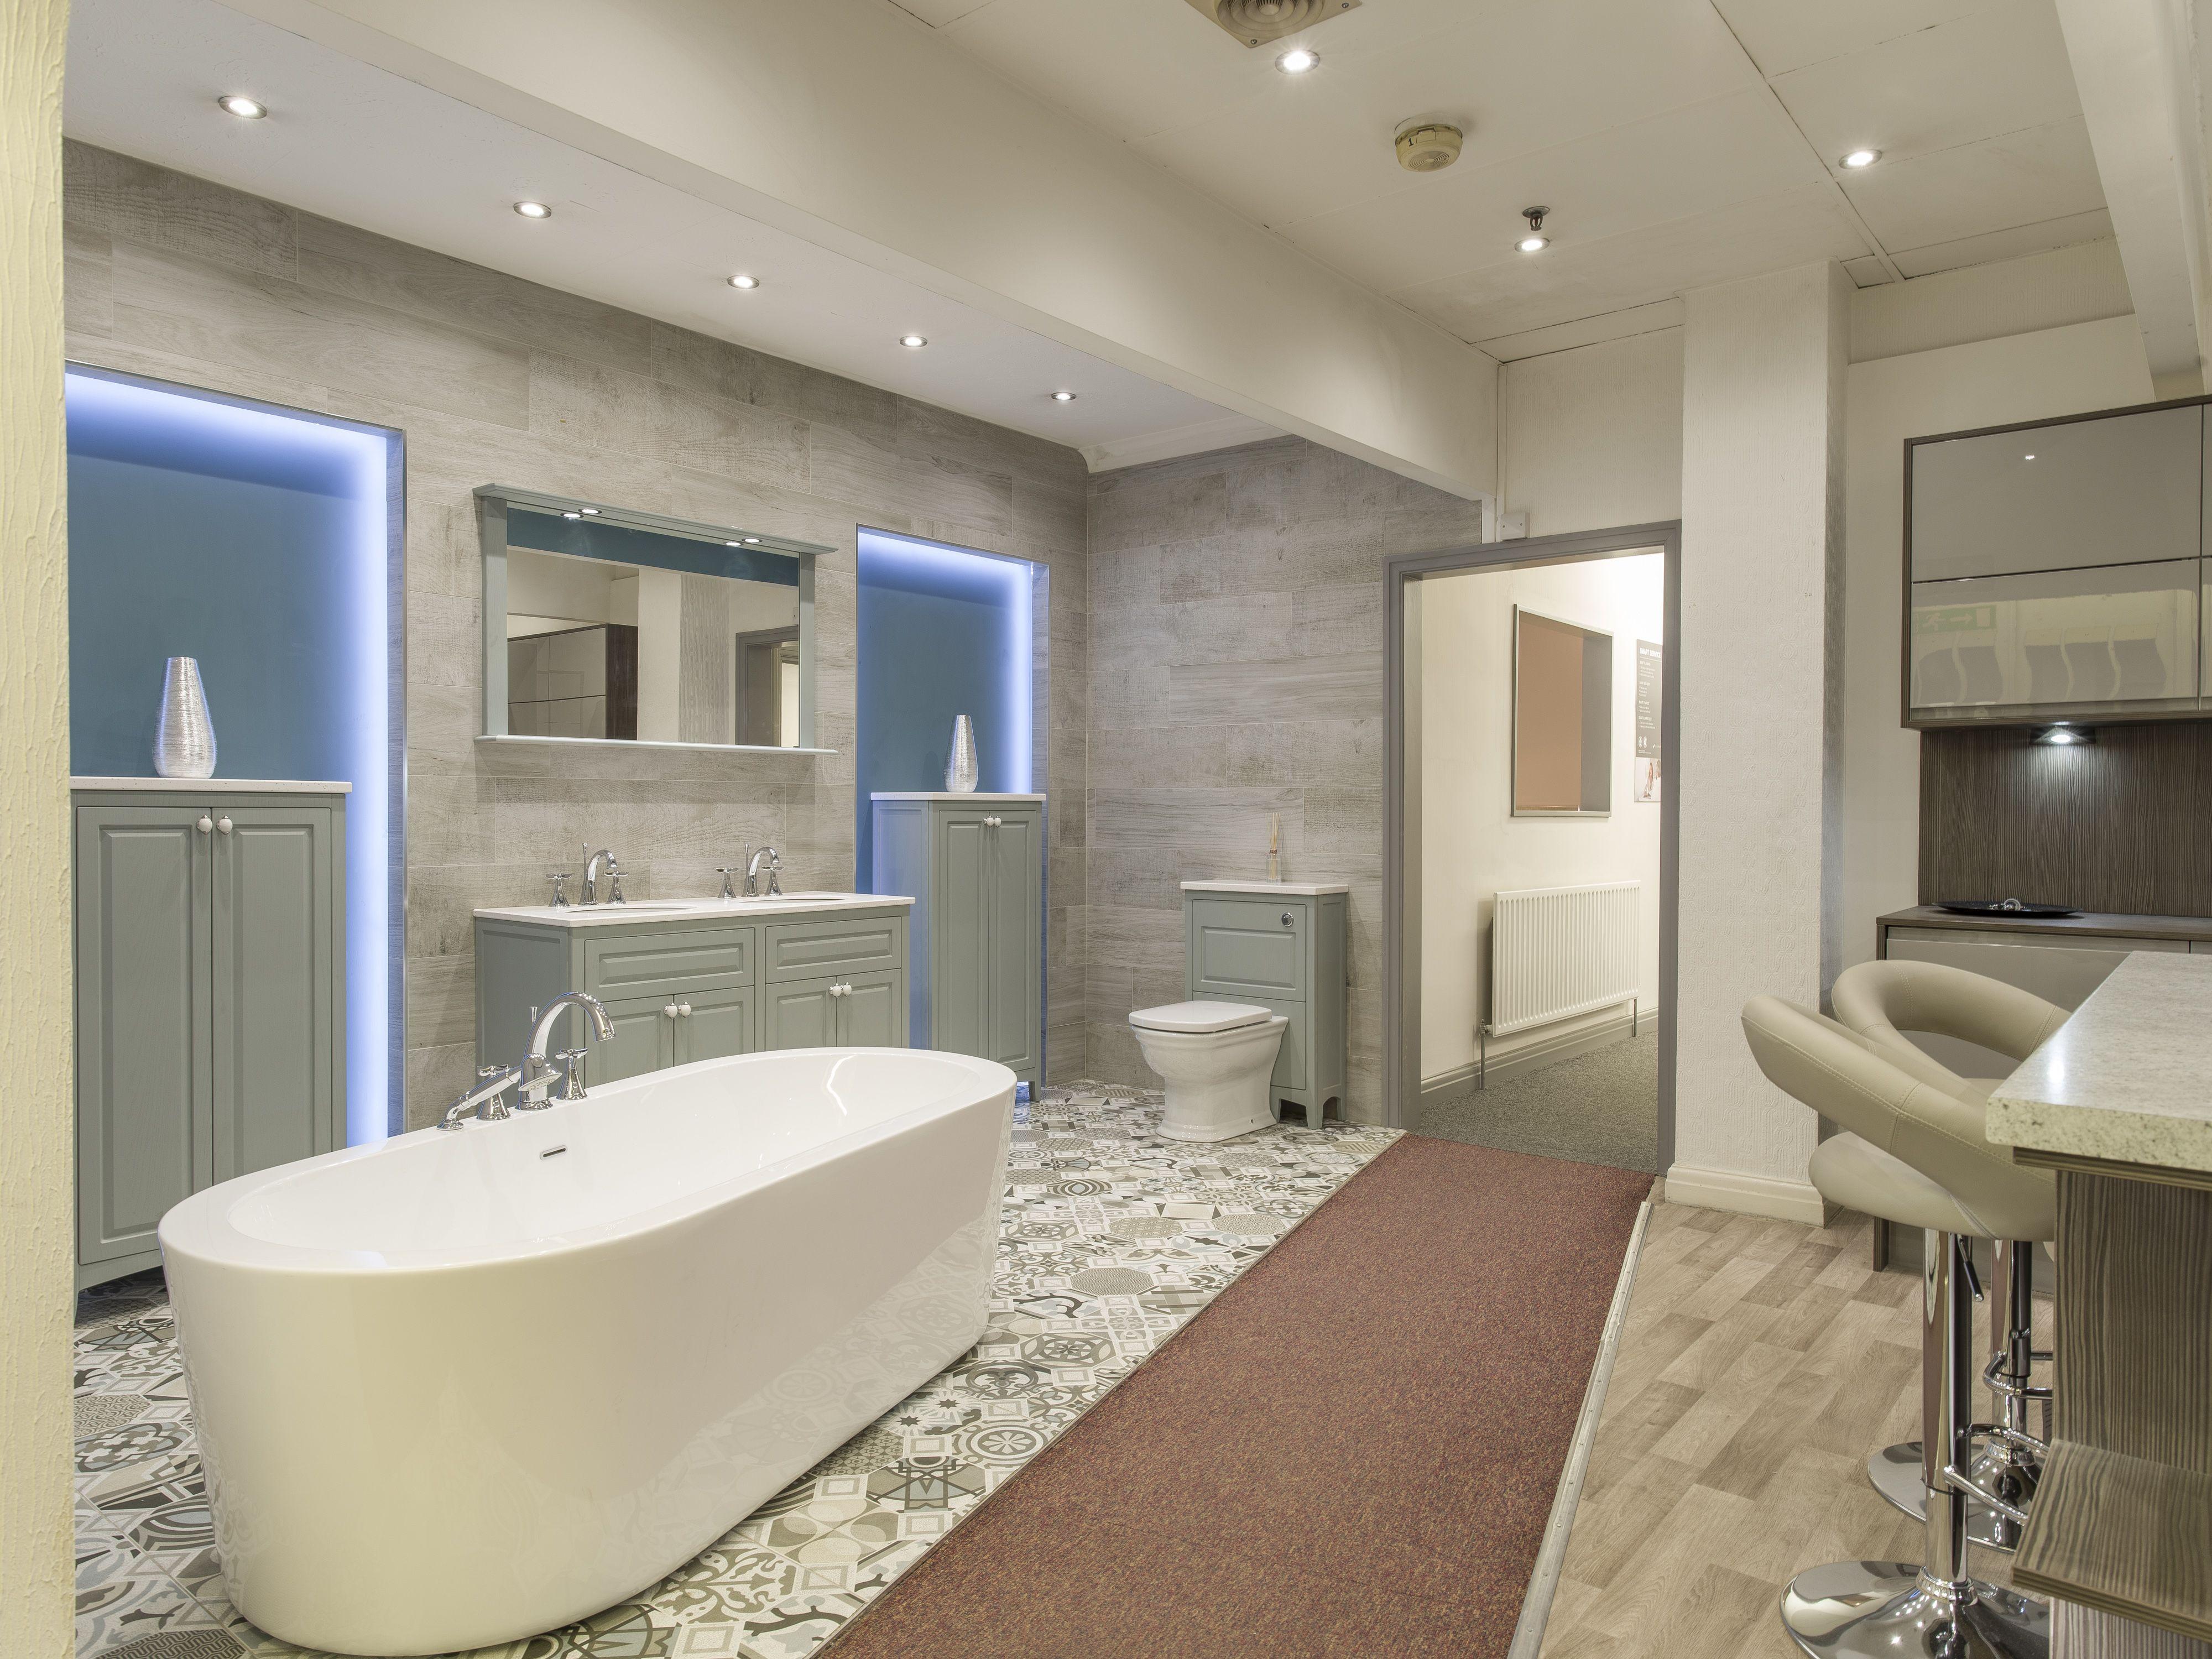 Buildbase Bathroom Showrooms Bathroom Showrooms Stunning Bathrooms Best Bathroom Colors